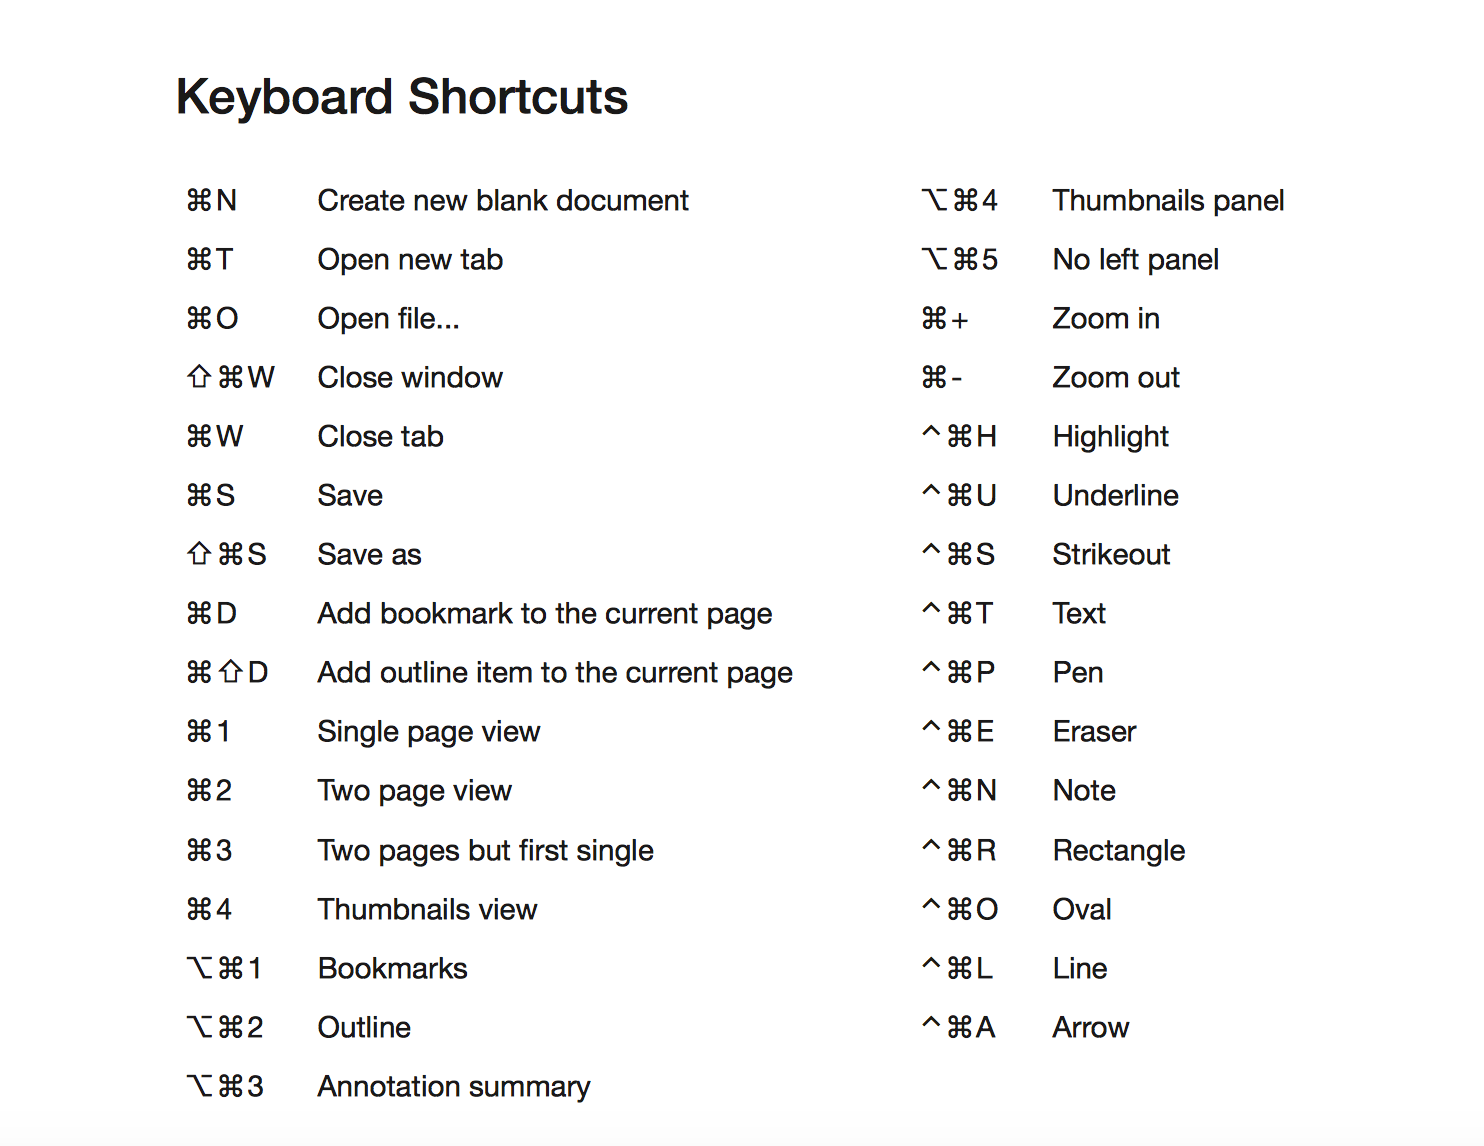 Shortcuts/Keyboard Shortcuts | Help Center